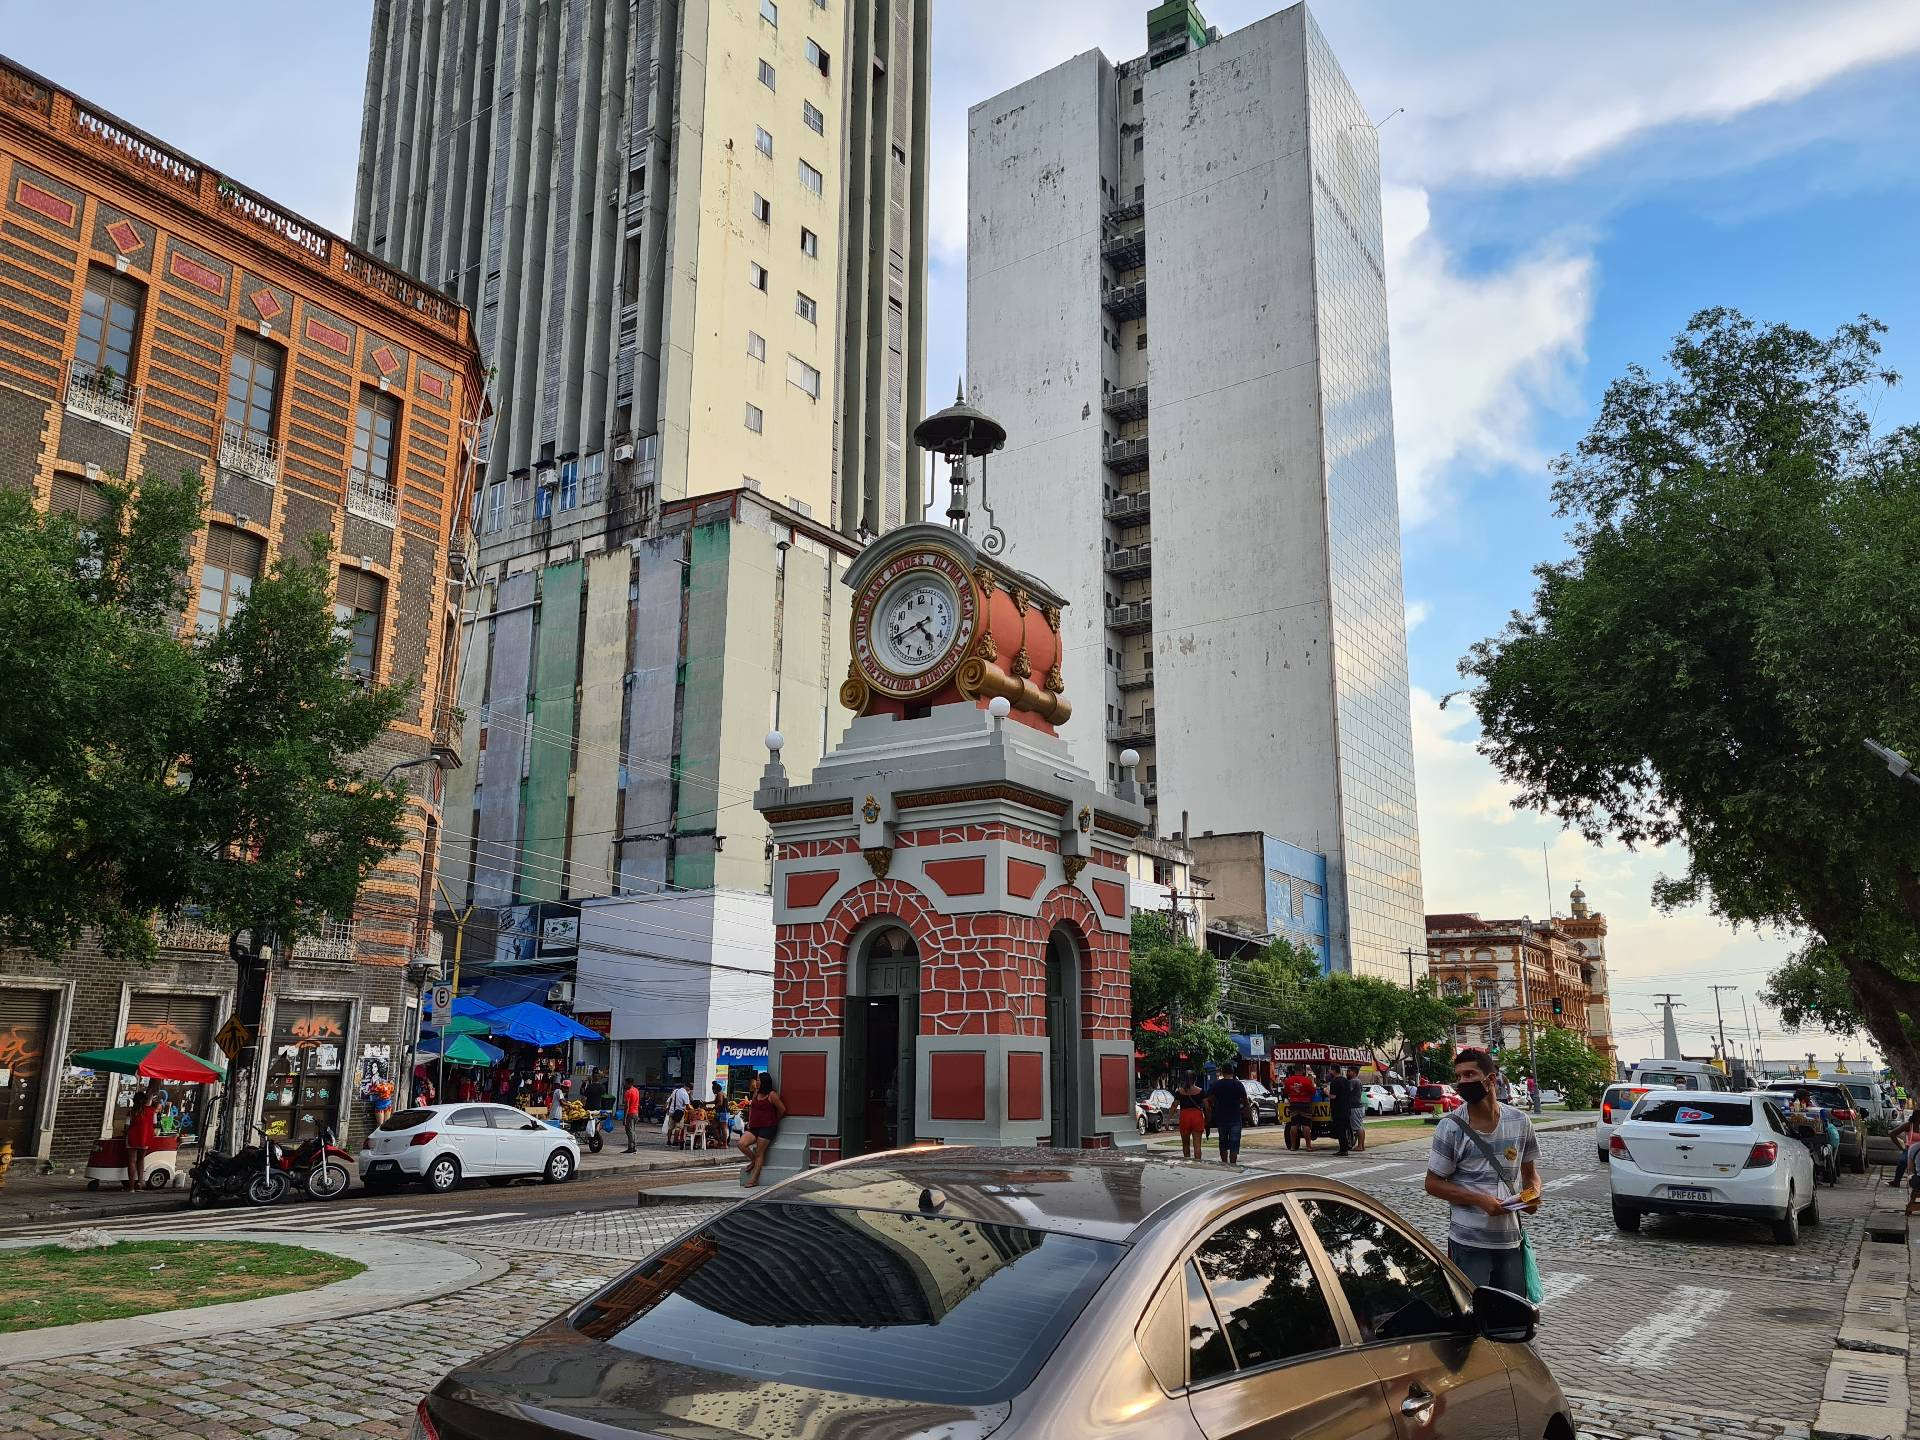 монумент в виде часов, Манаус